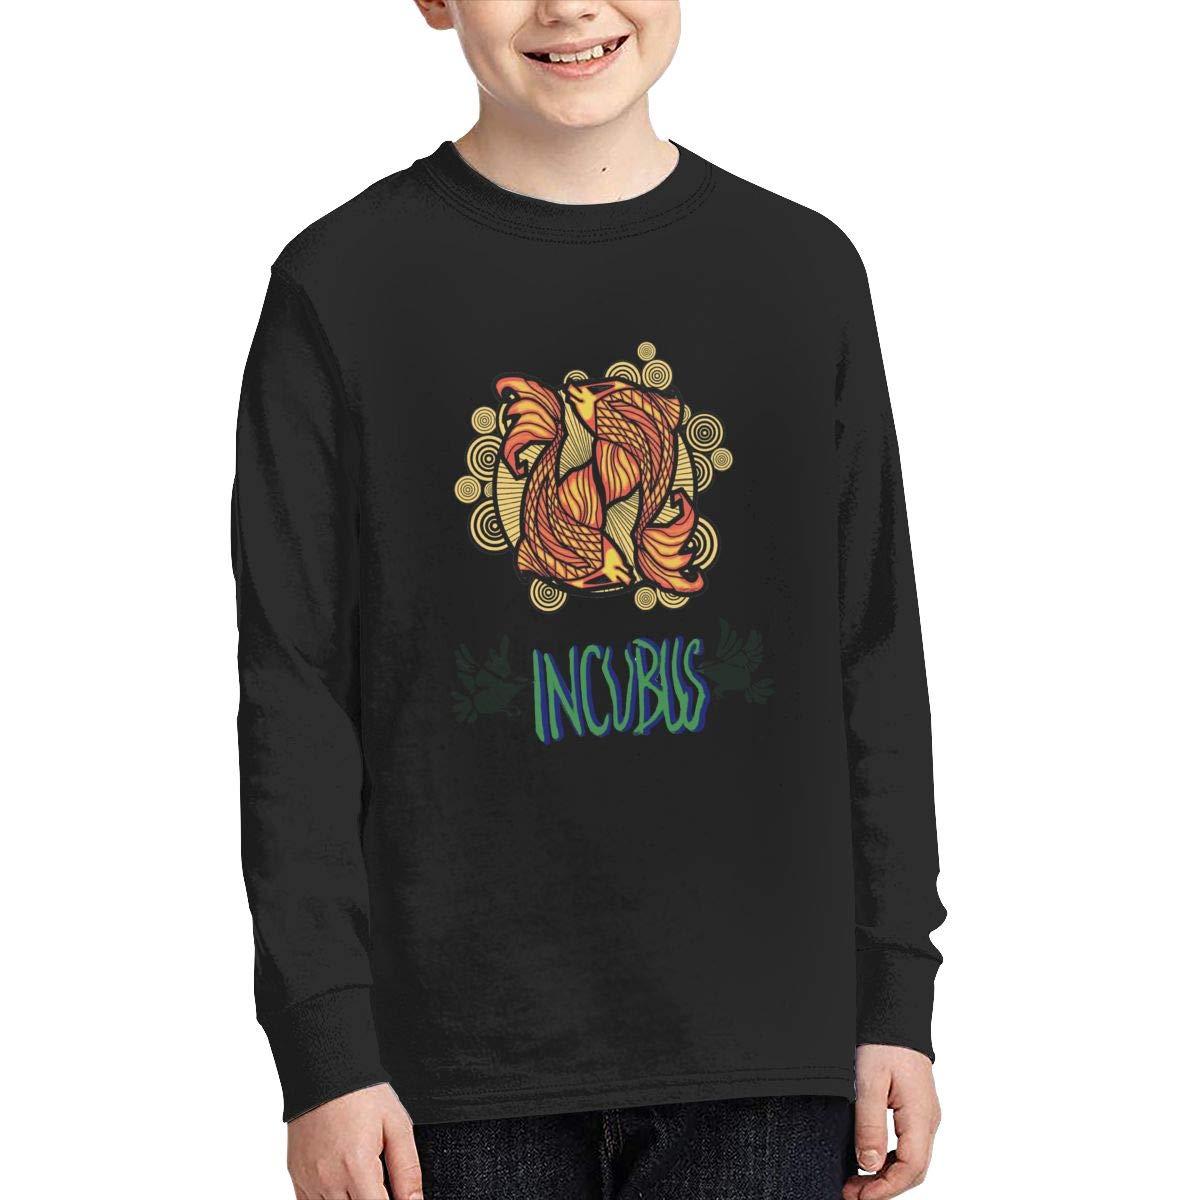 Optumus Incubus by Leeway Kids Sweatshirts Long Sleeve T Shirt Boy Girl Children Teenagers Unisex Tee